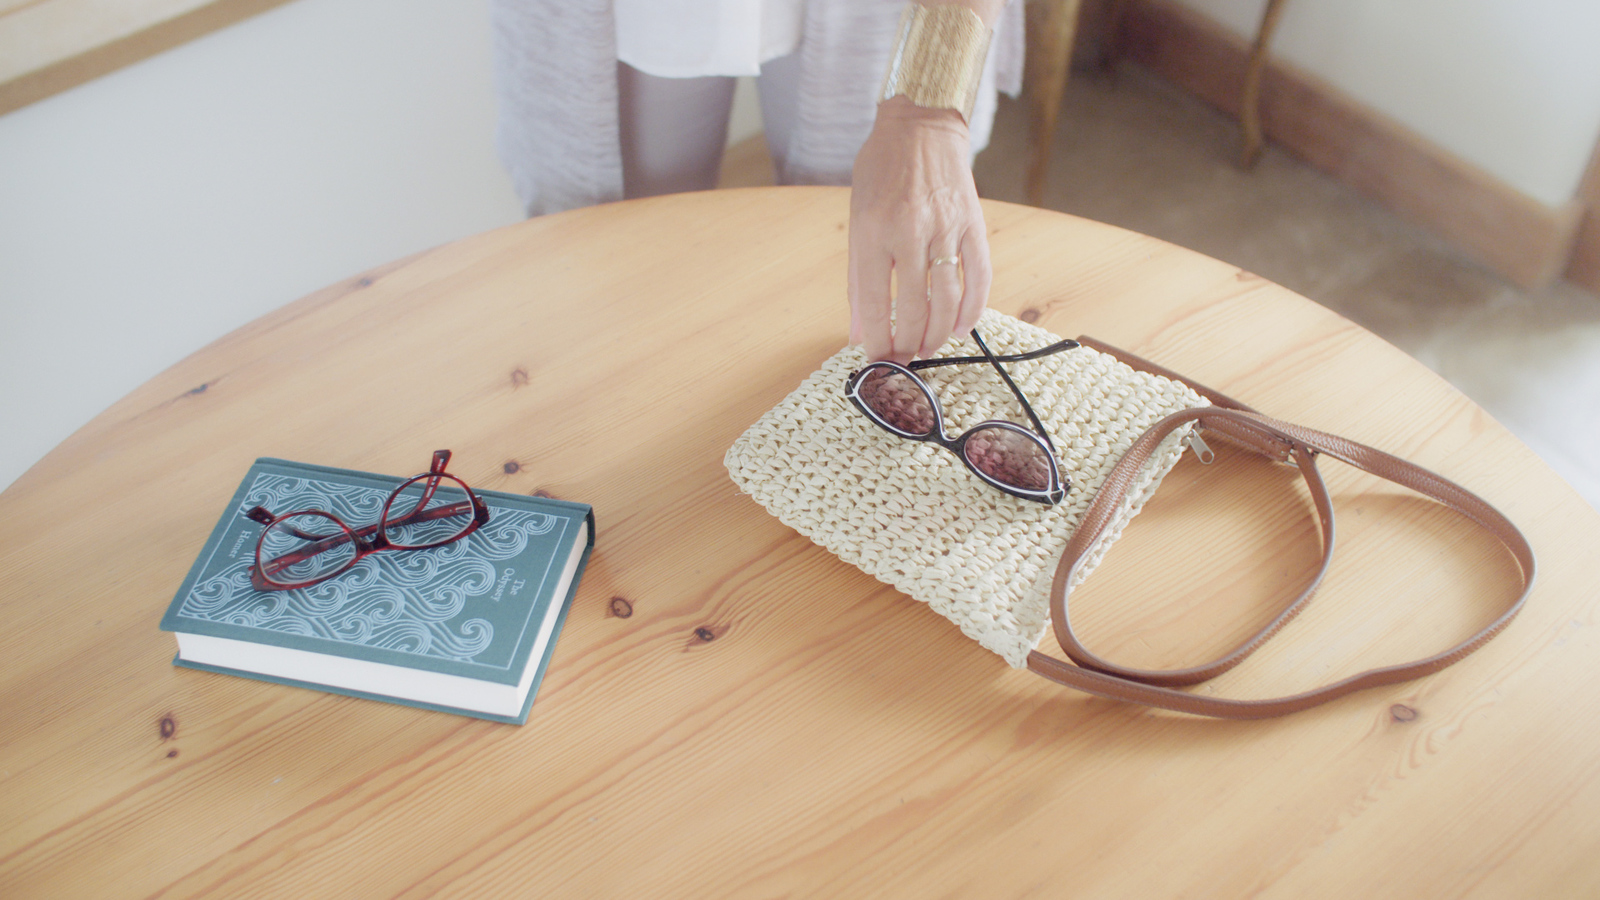 Production still of lady choosing sunglasses